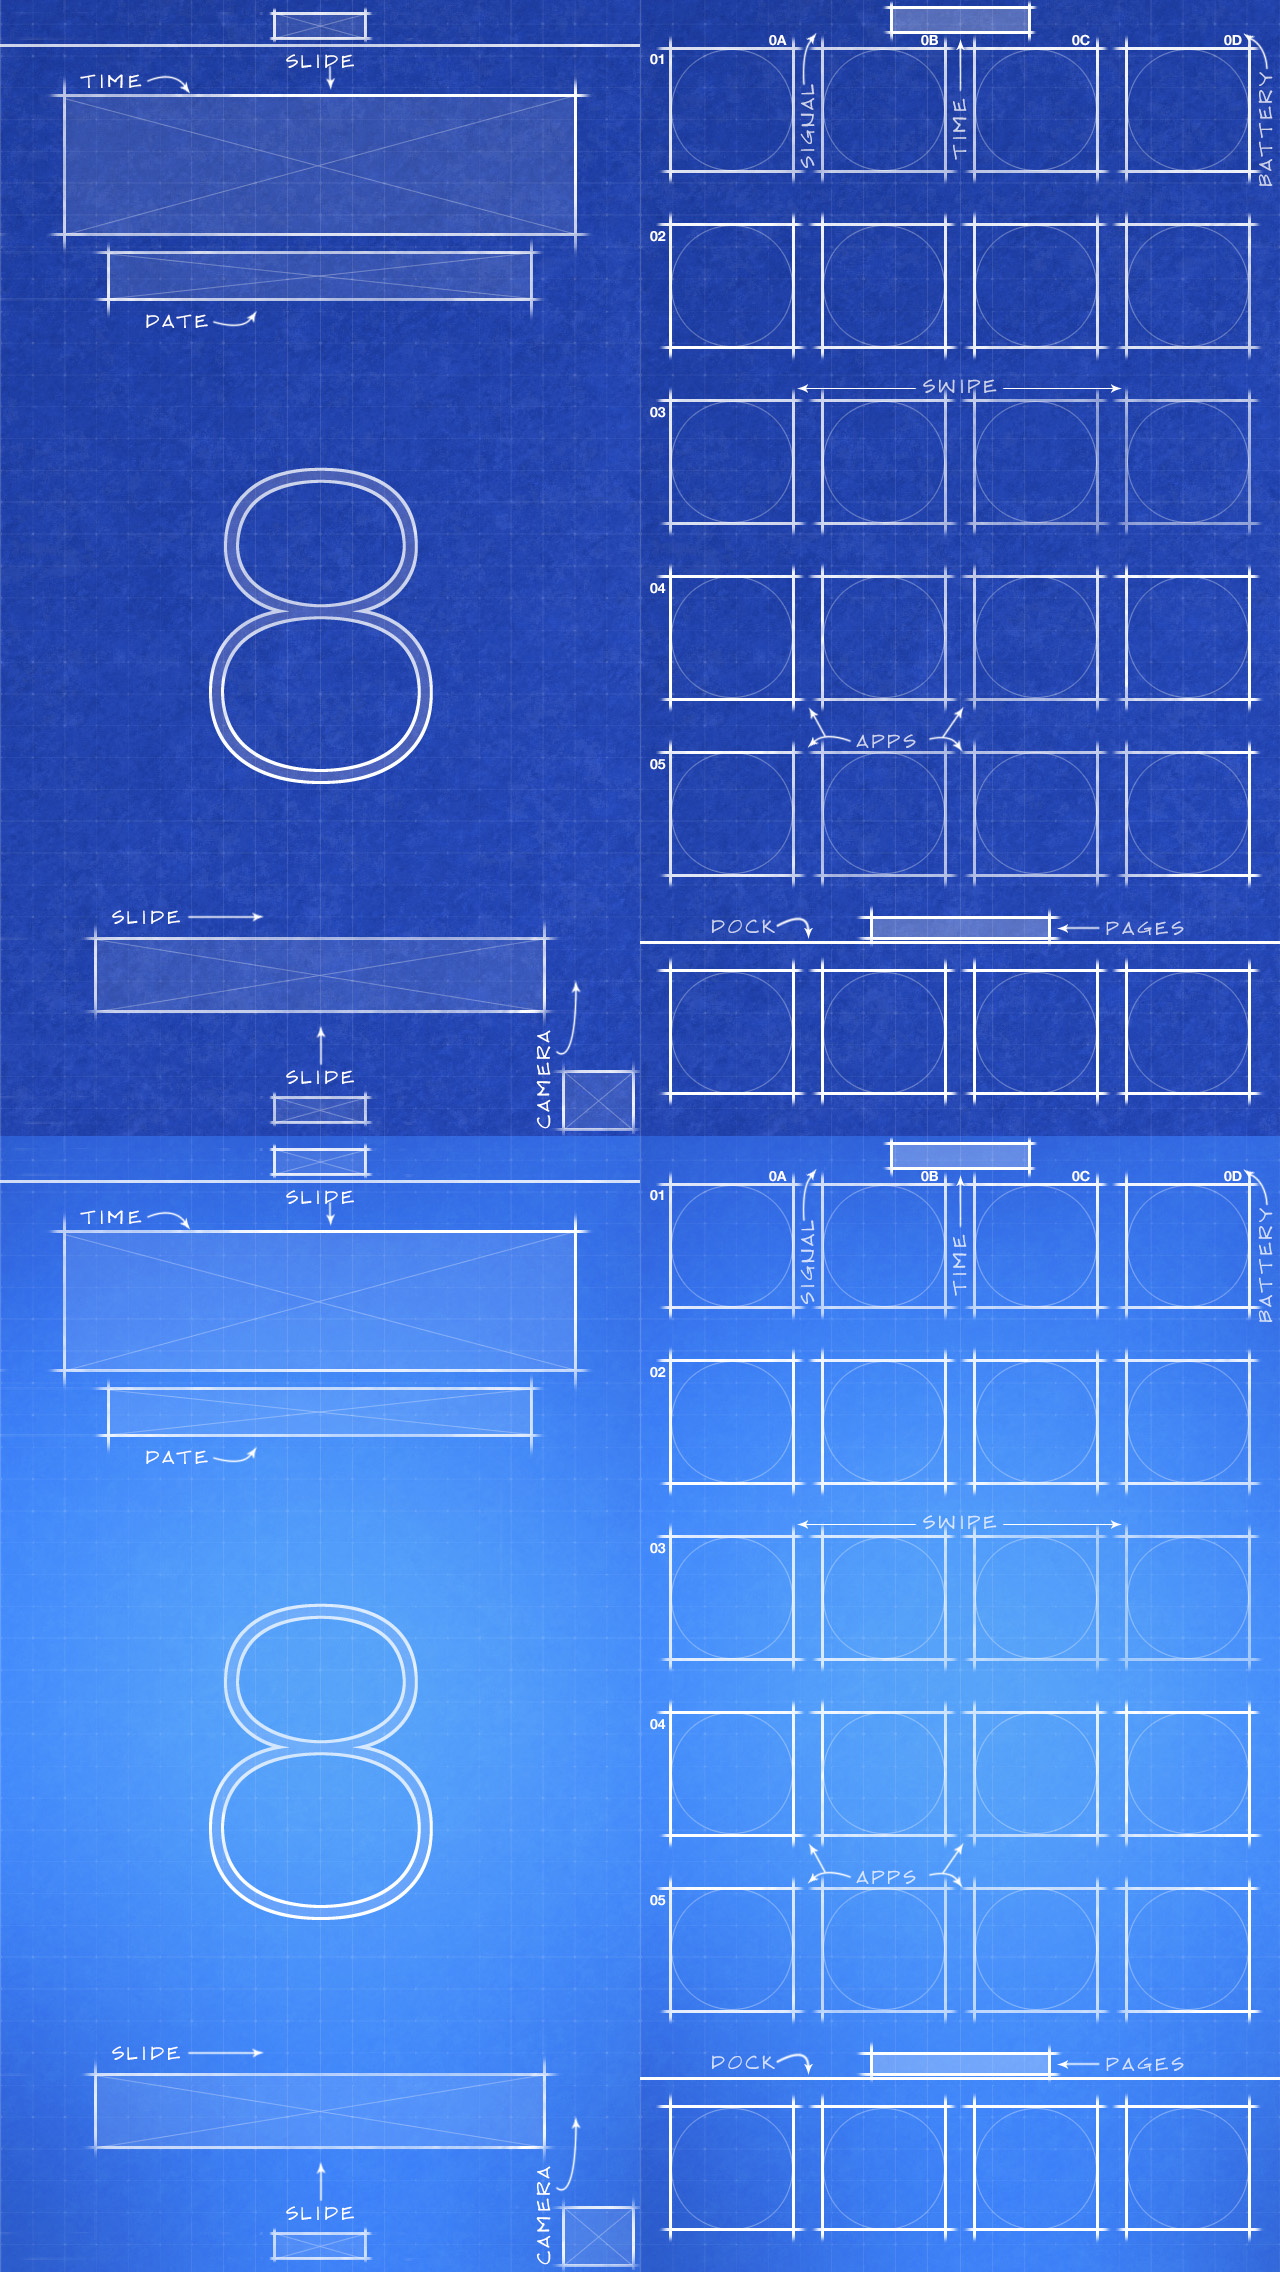 Iphone 5 ios 8 blueprint wallpaper by jessemunoz on deviantart iphone 5 ios 8 blueprint wallpaper by jessemunoz malvernweather Image collections